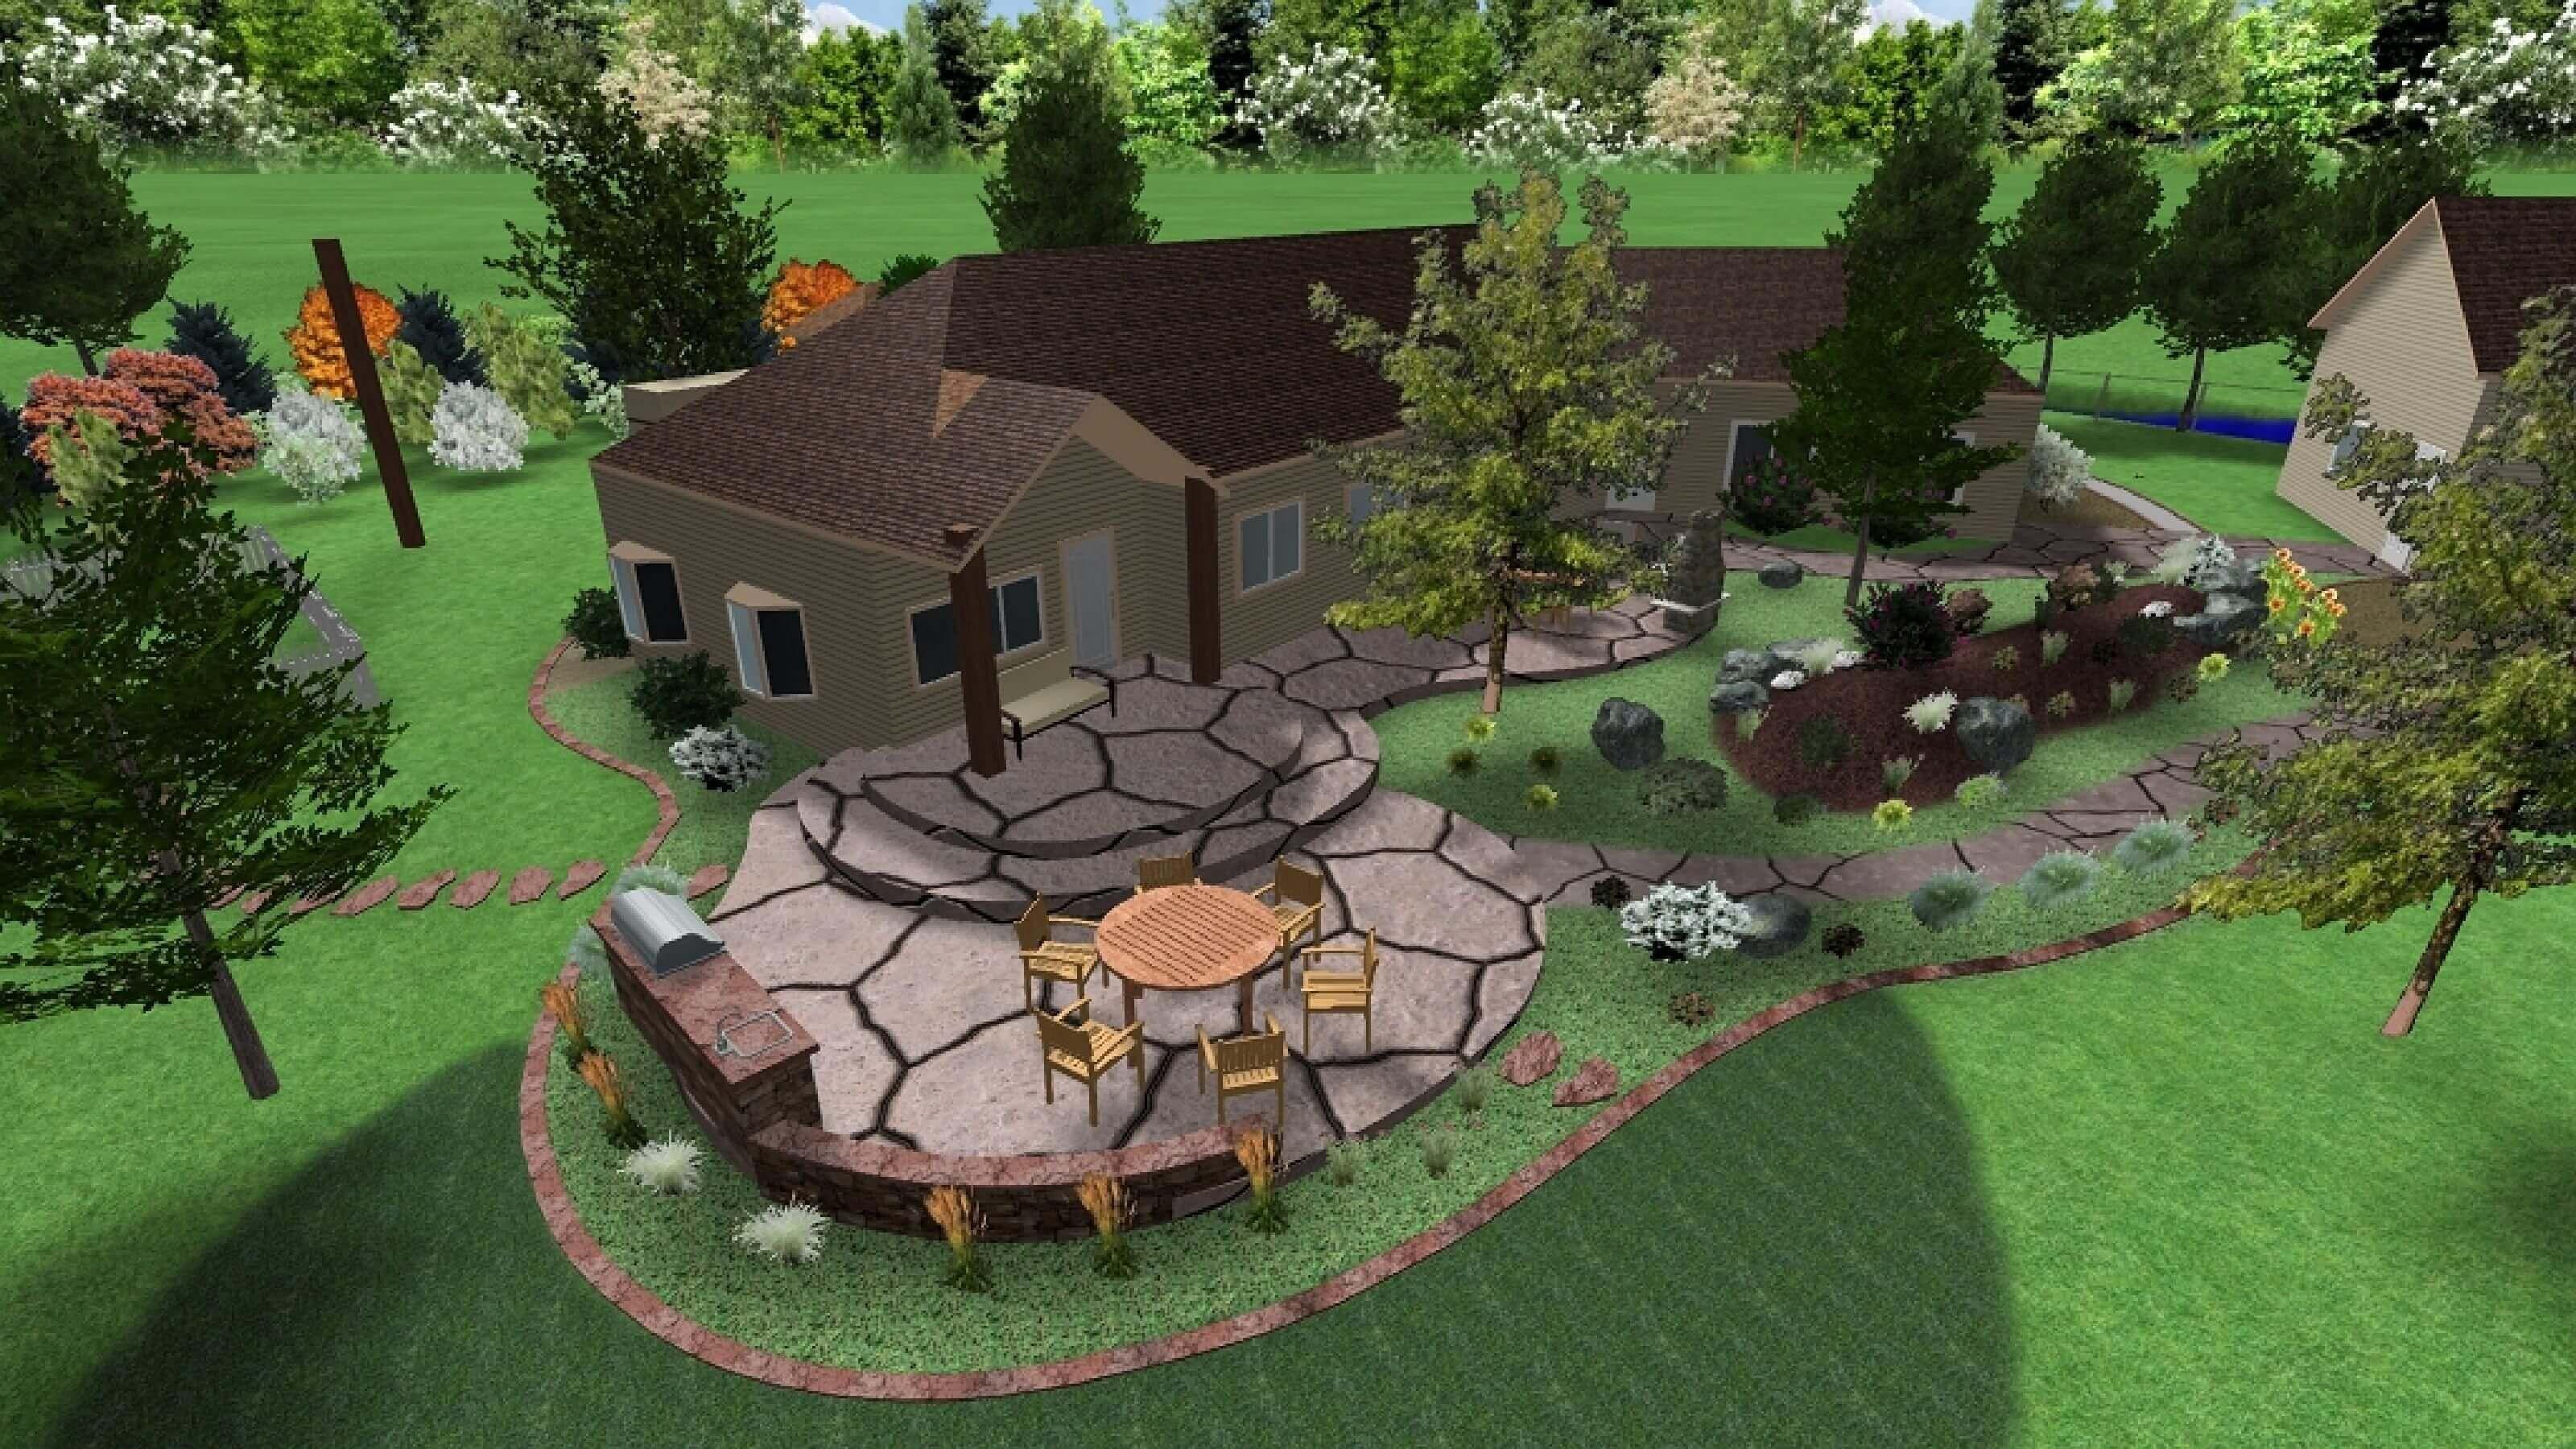 Pin By Online Landscape Designs On Landscape Designs Landscape Design Landscape Design Services Online Landscape Design